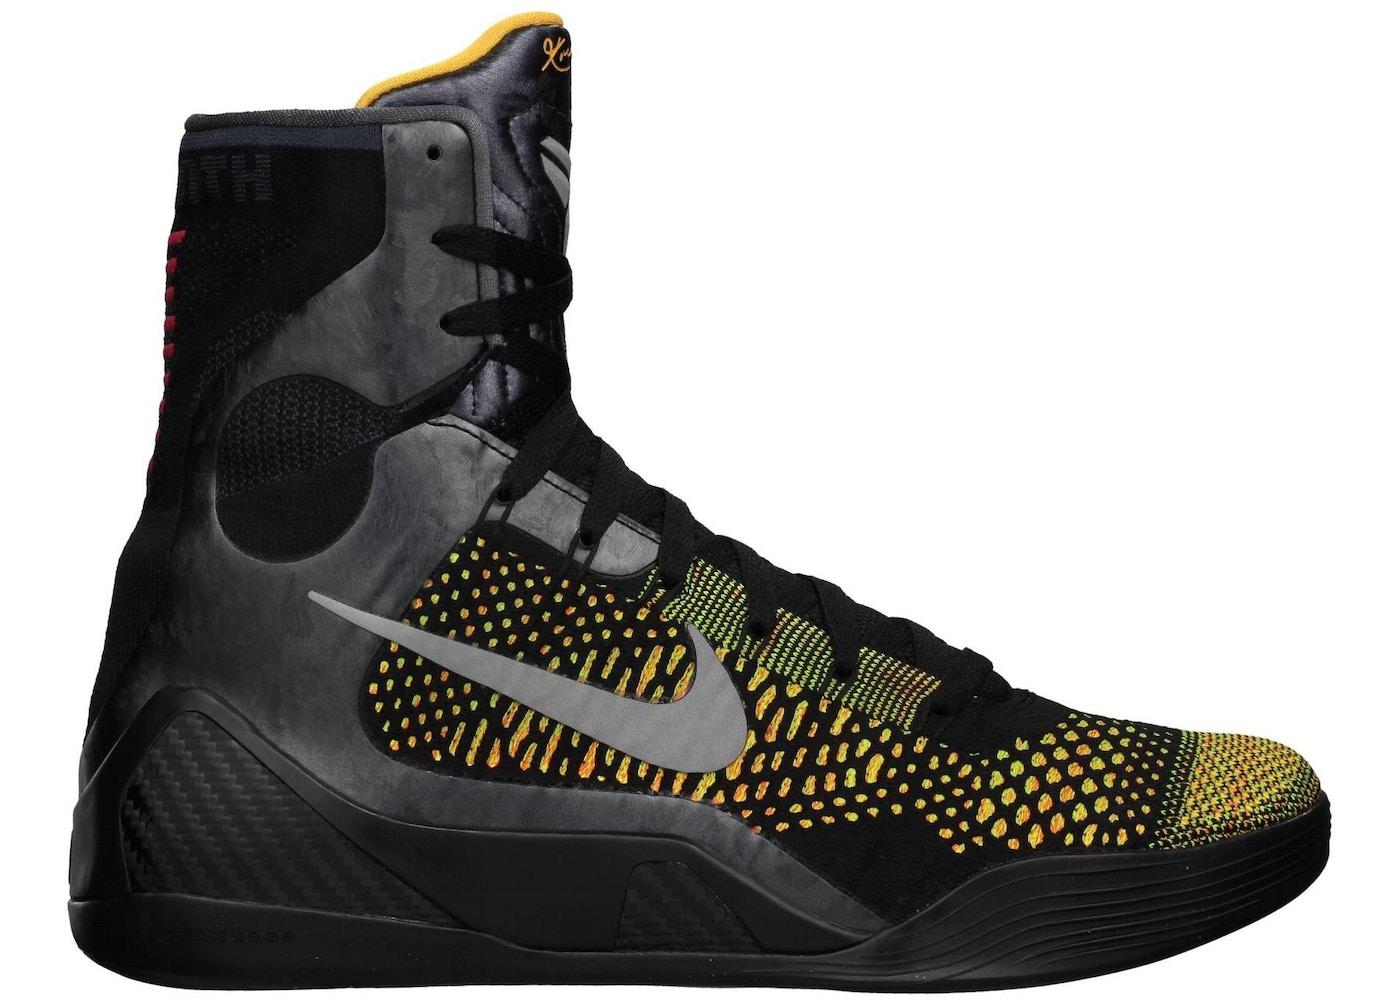 Buy Nike Kobe 9 Shoes & Deadstock Sneakers